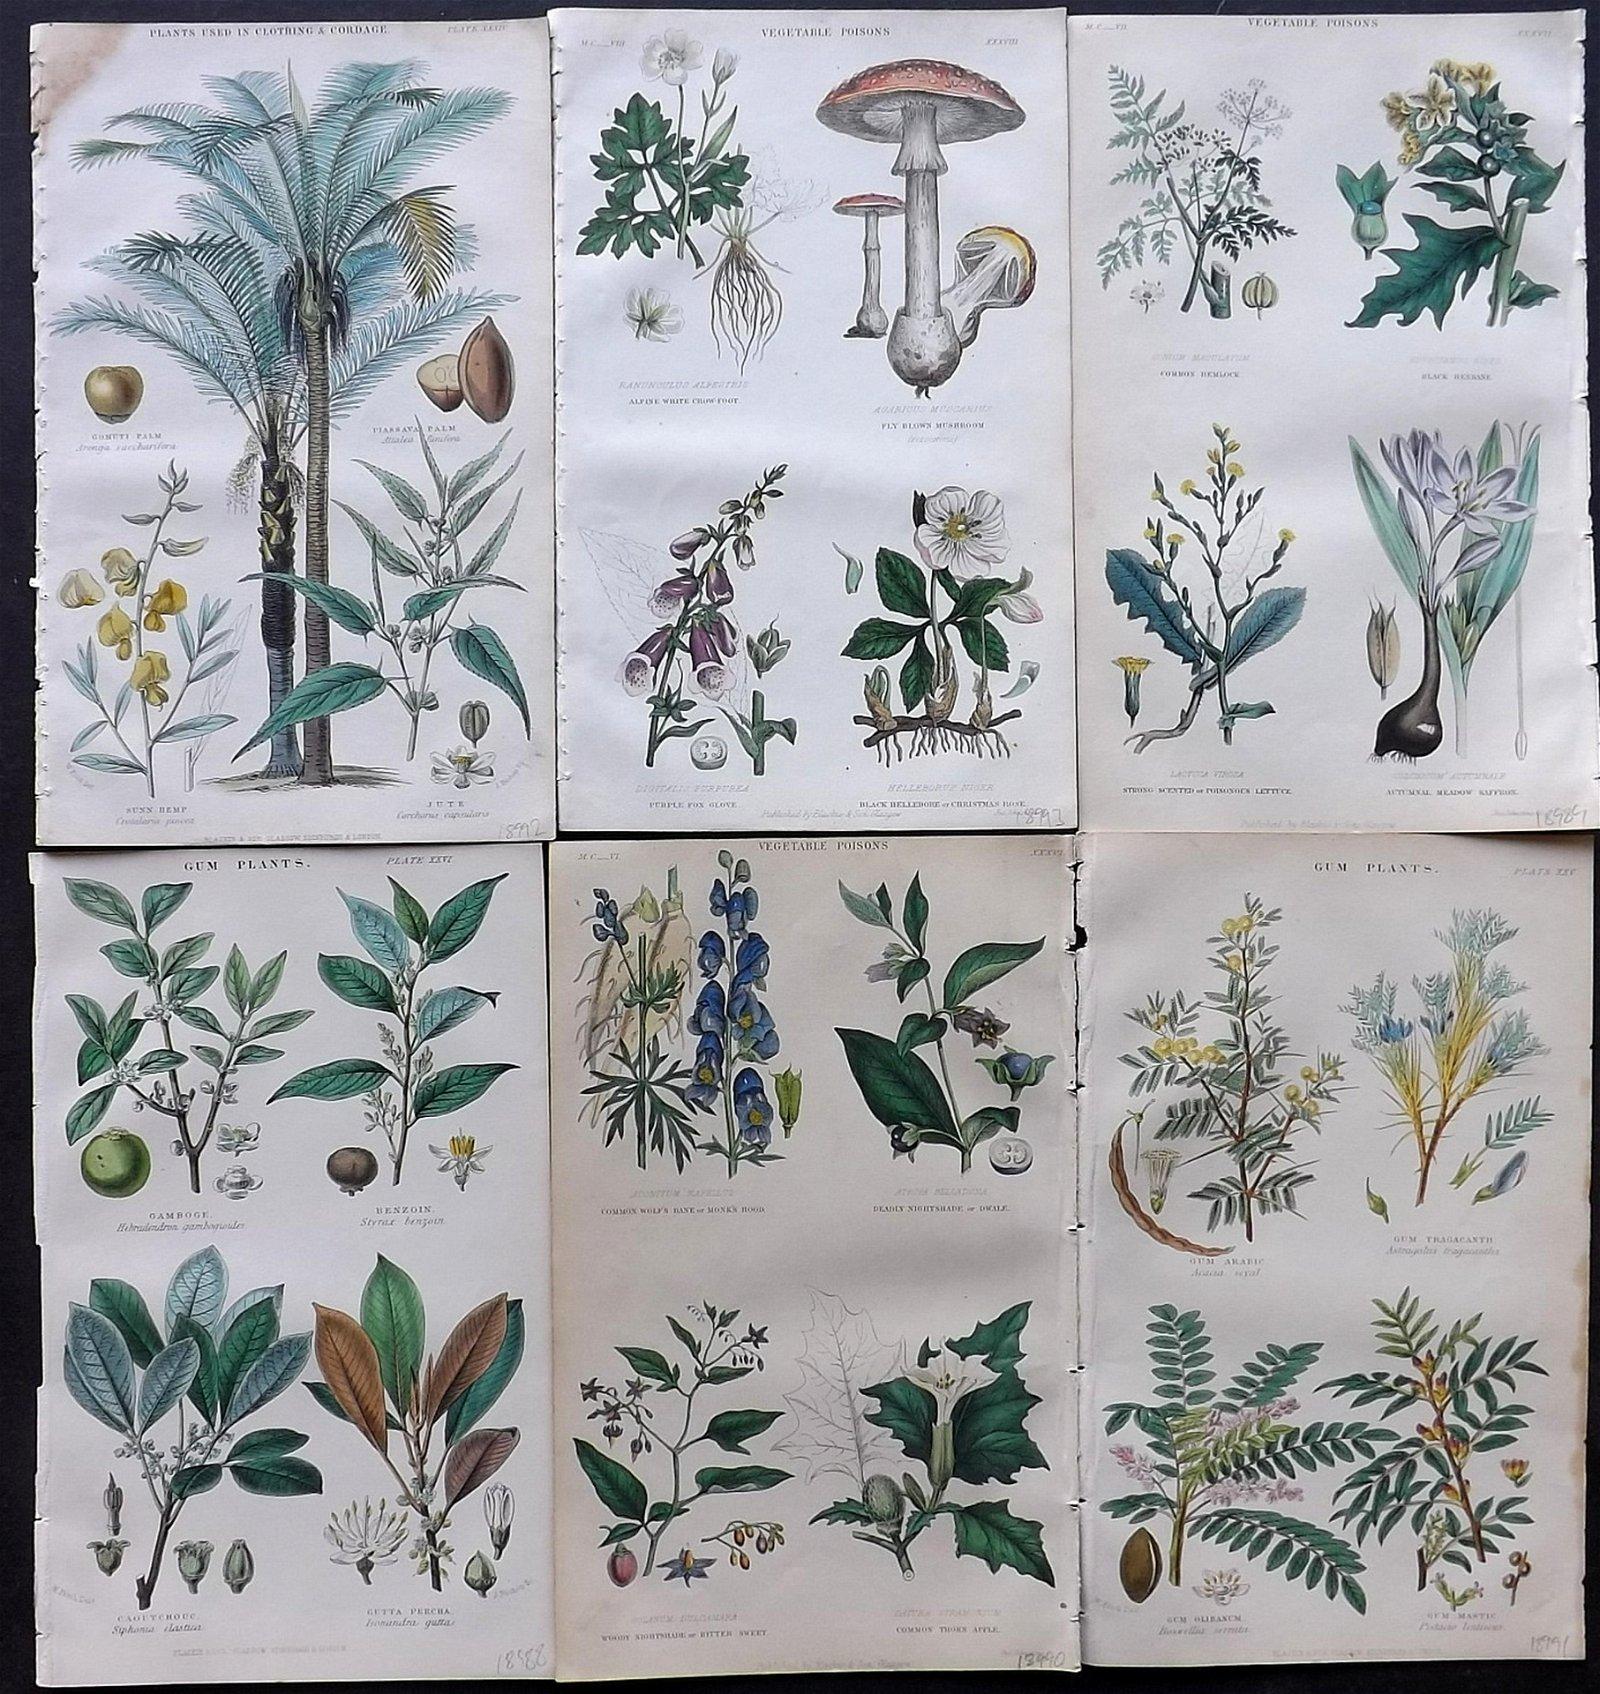 Rhind, William 1866 Lot of 6 Hand Col Botanical Prints